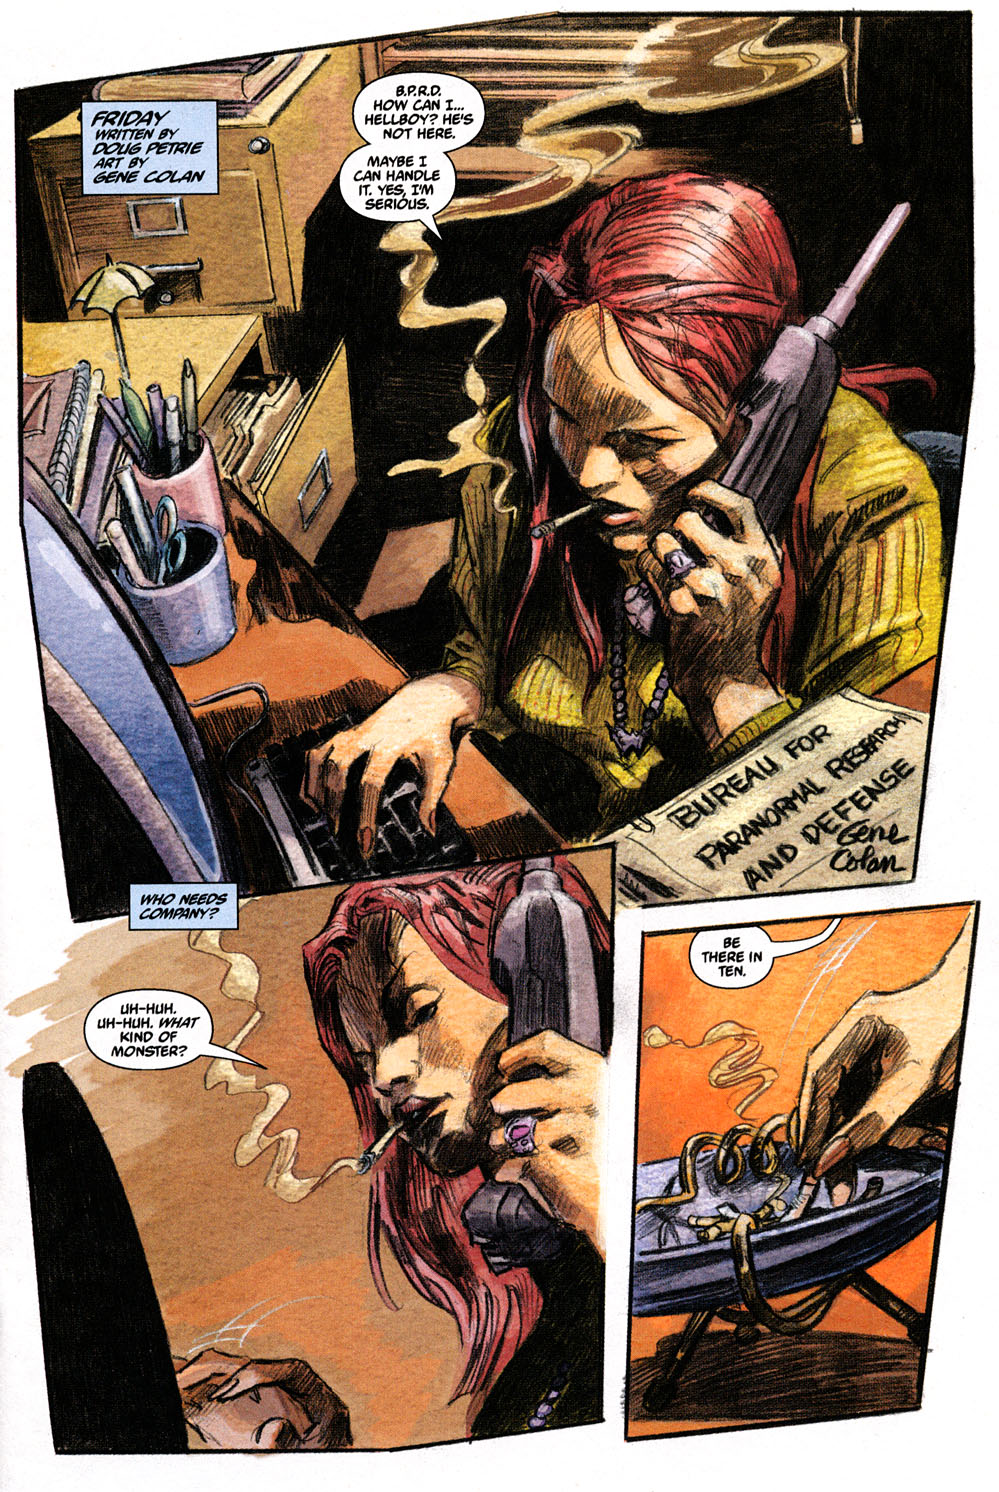 Read online Hellboy: Weird Tales comic -  Issue #6 - 11